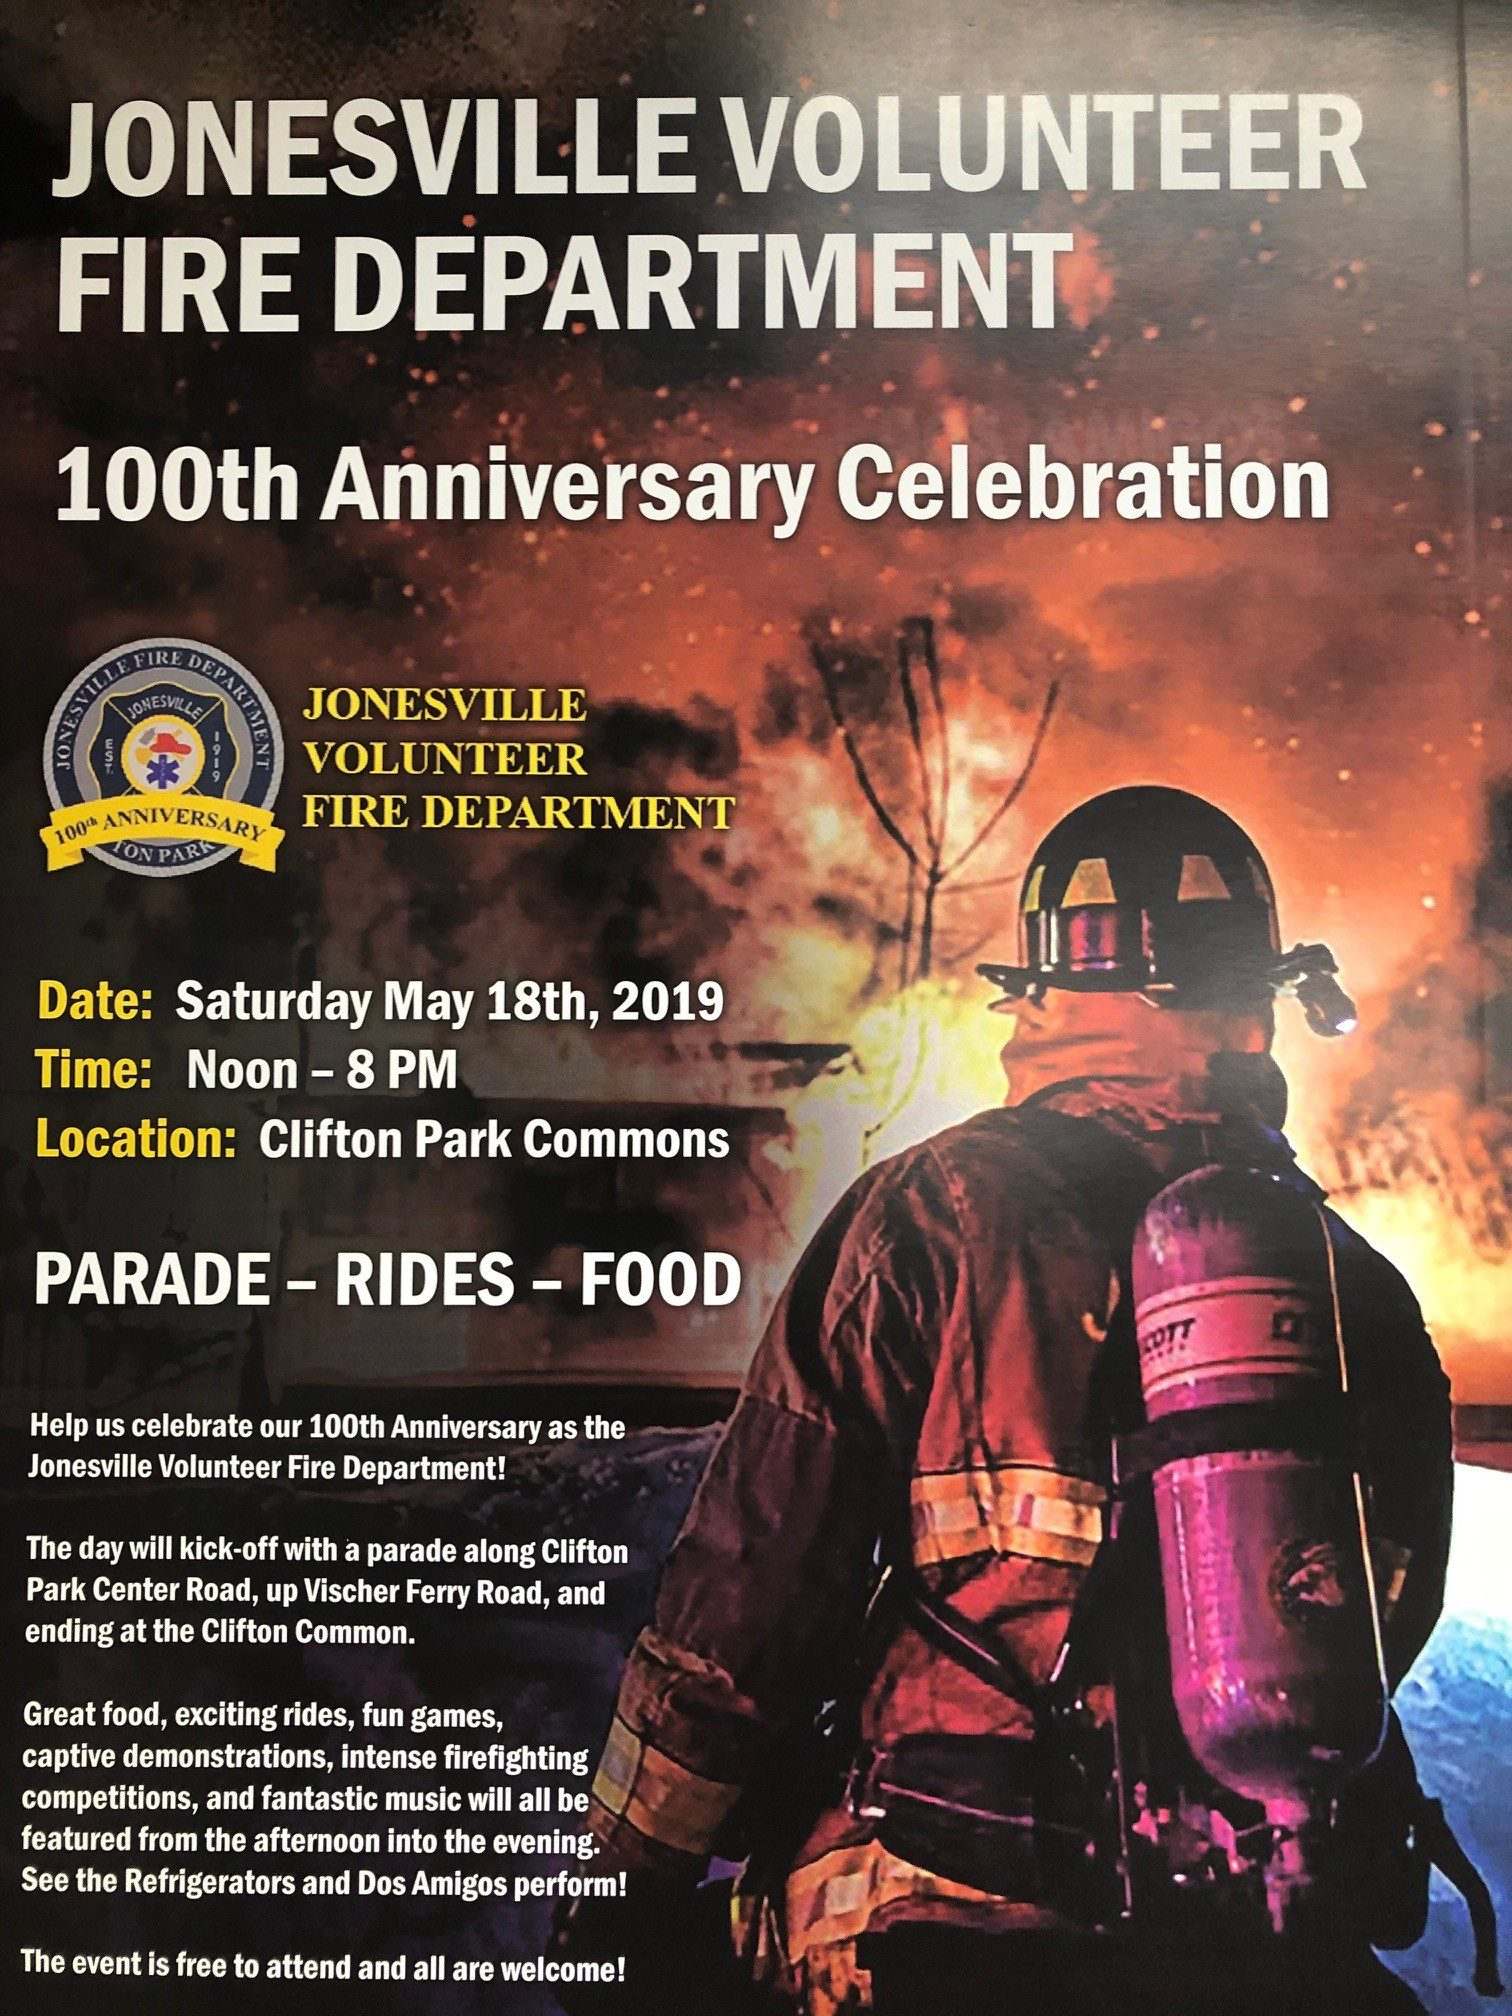 Jonesville Volunteer Fire Department 100th Anniversary Celebration Information